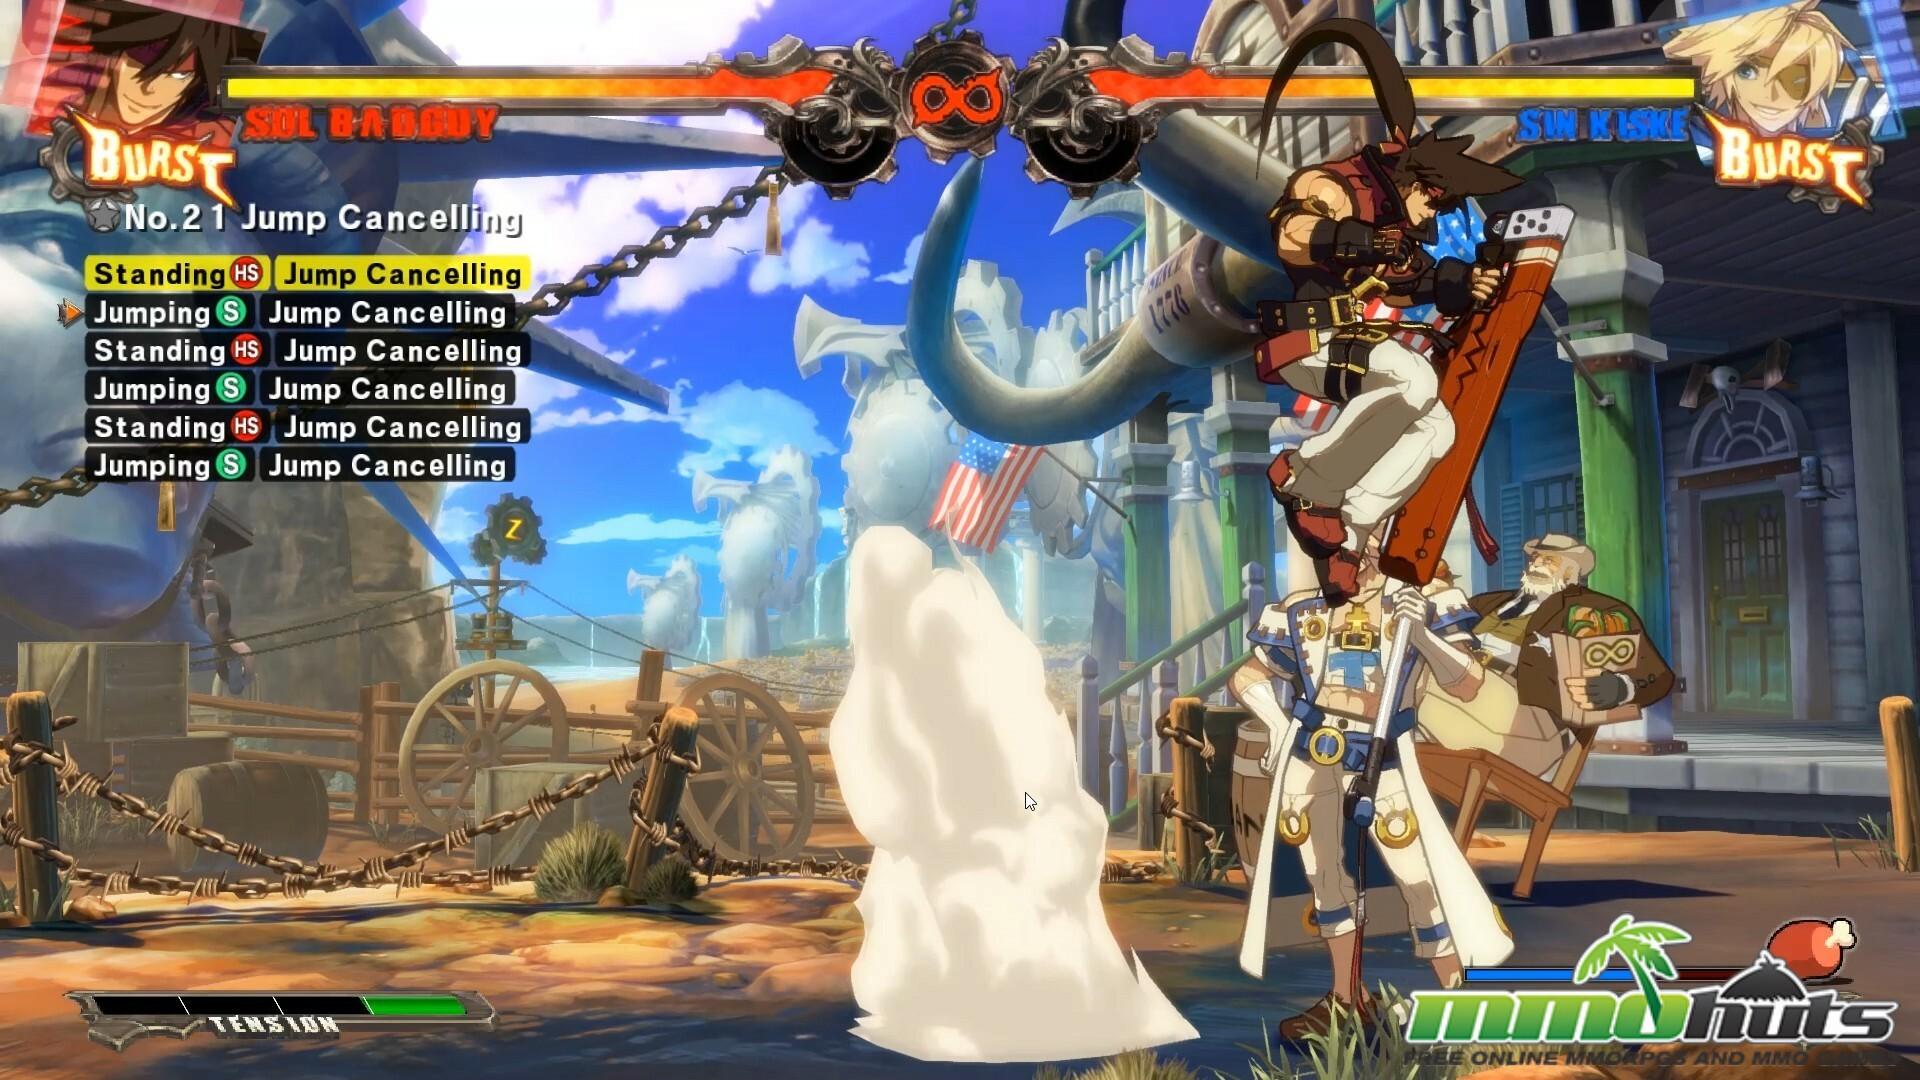 Guilty Gear Xrd -SIGN-: Legitimizing PC Fighters